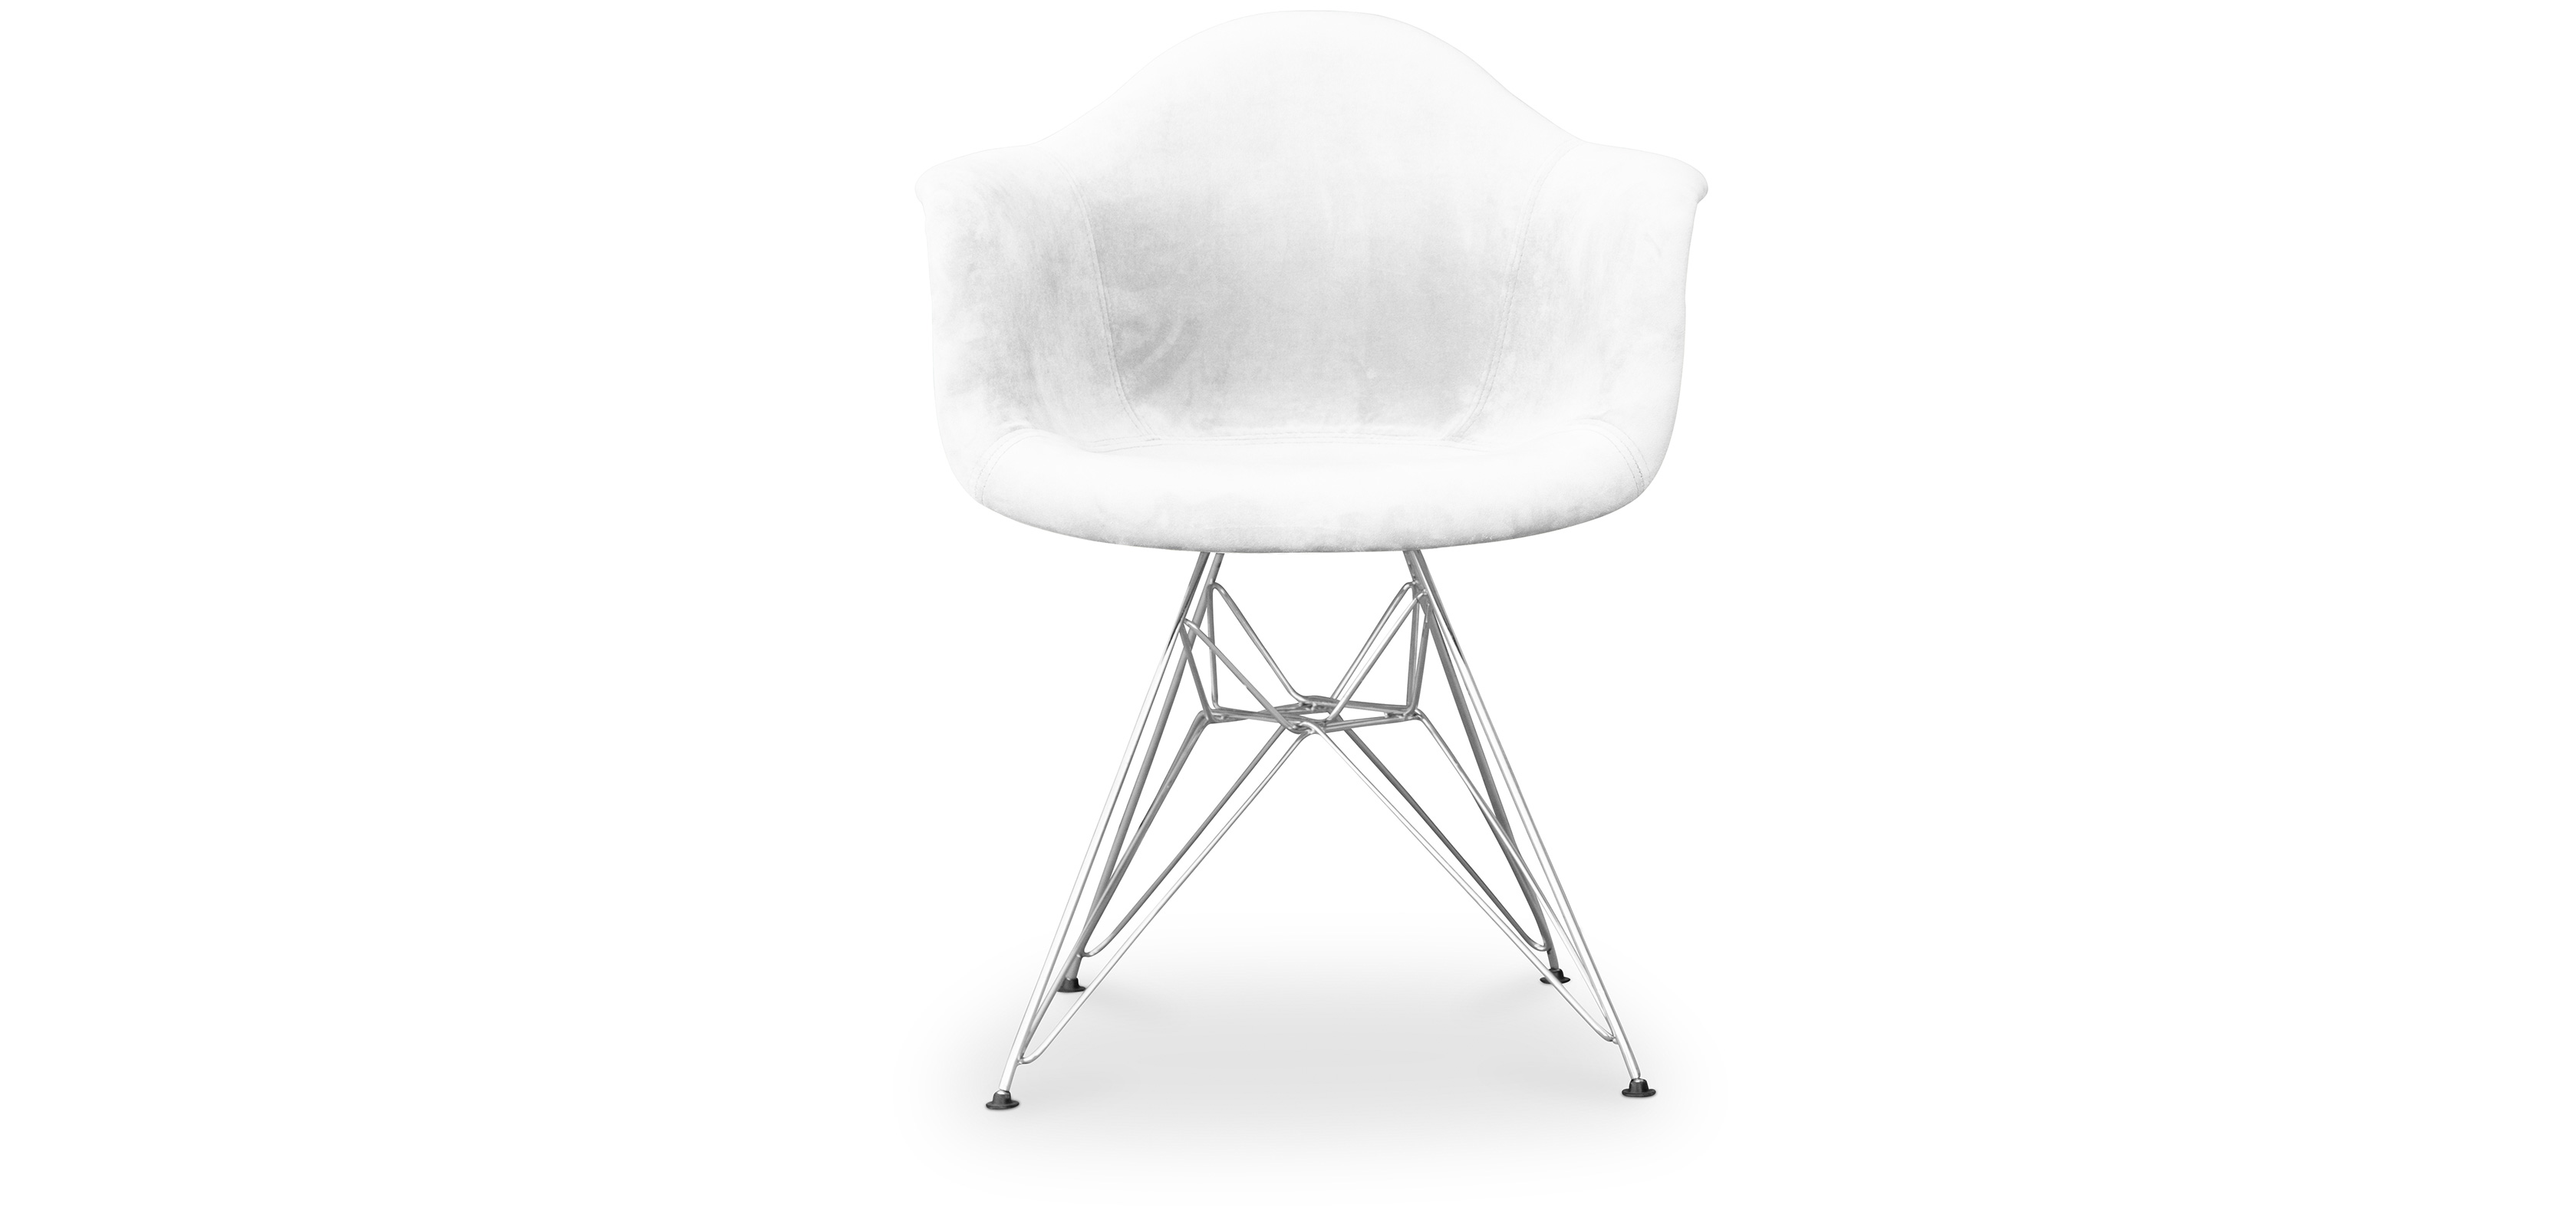 Sedia DAR Charles Eames